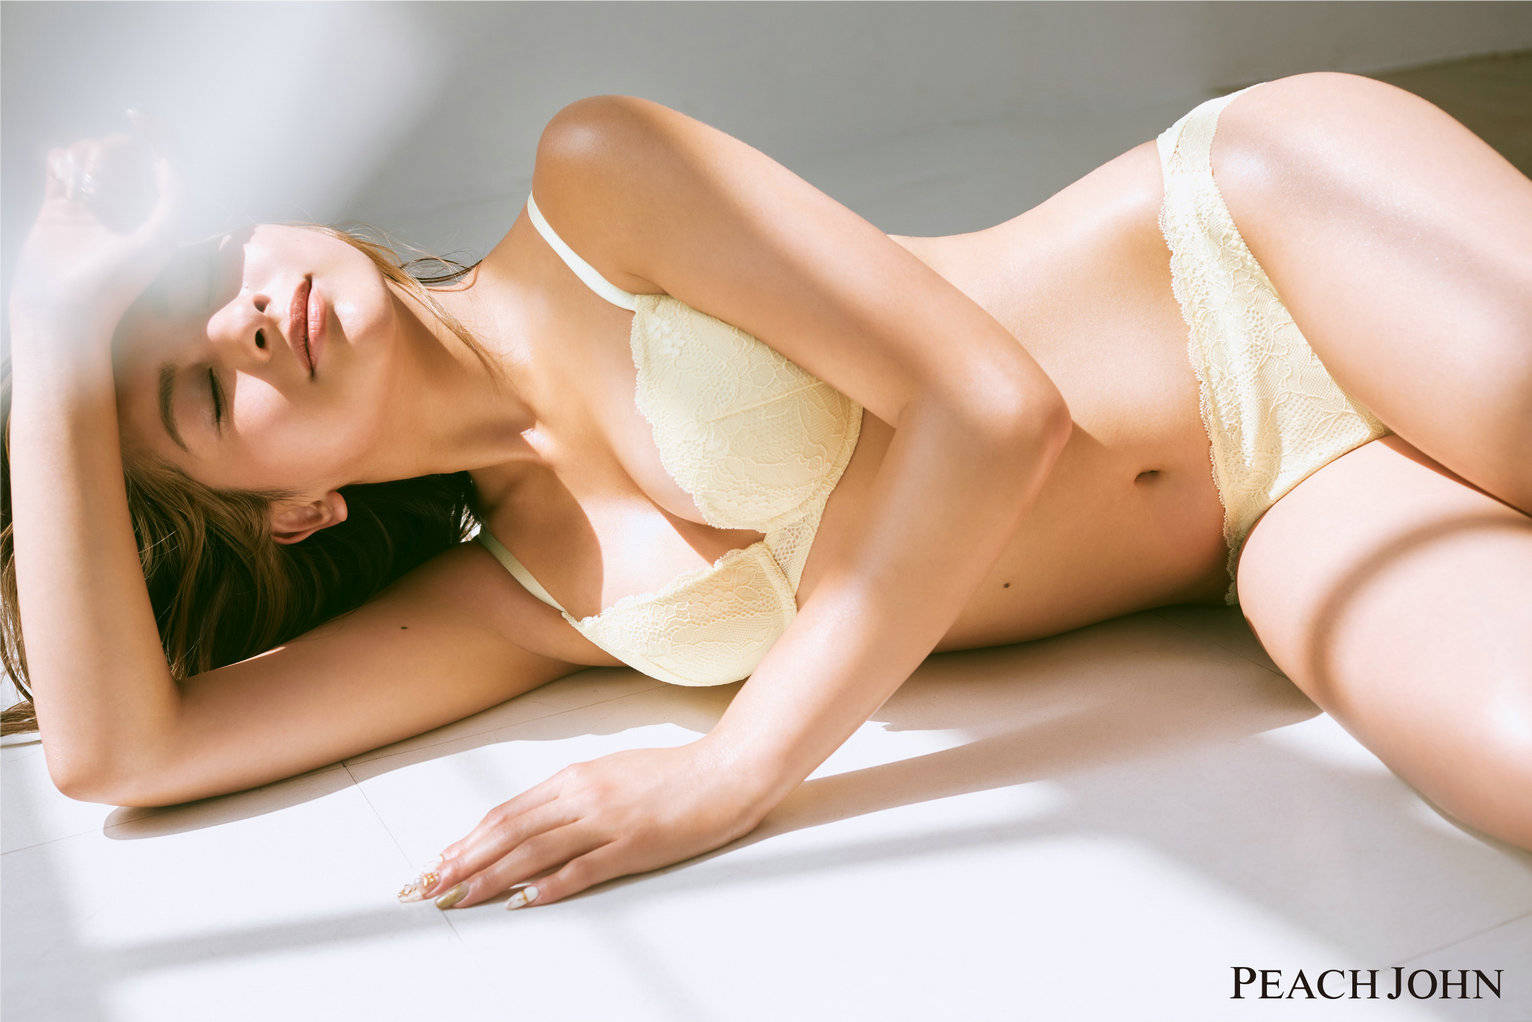 PEACH JOHN蜜桃派 美胸JOURNAL特辑——混血模特木村有希的美型秘诀